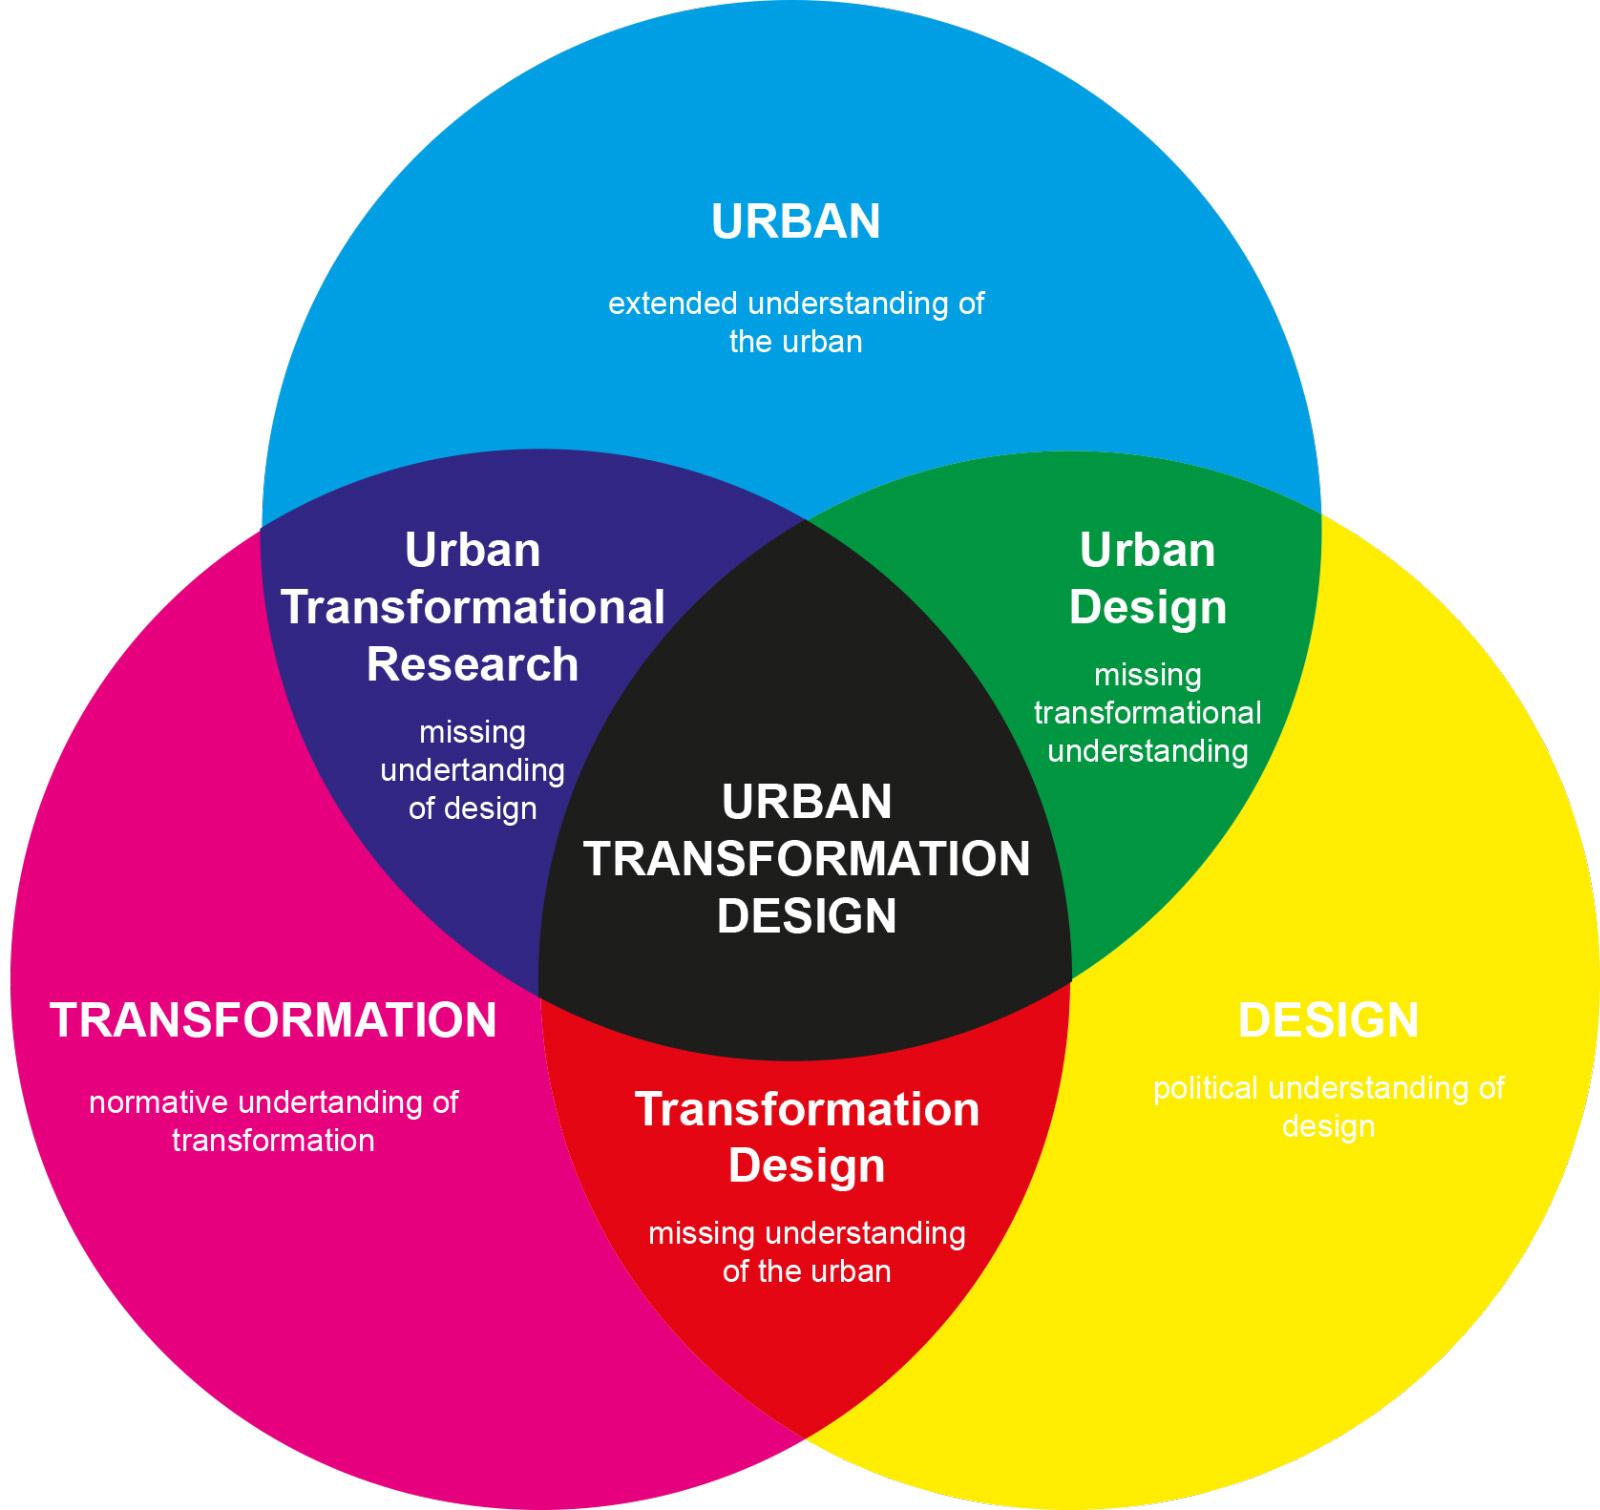 Urban Transformation Design